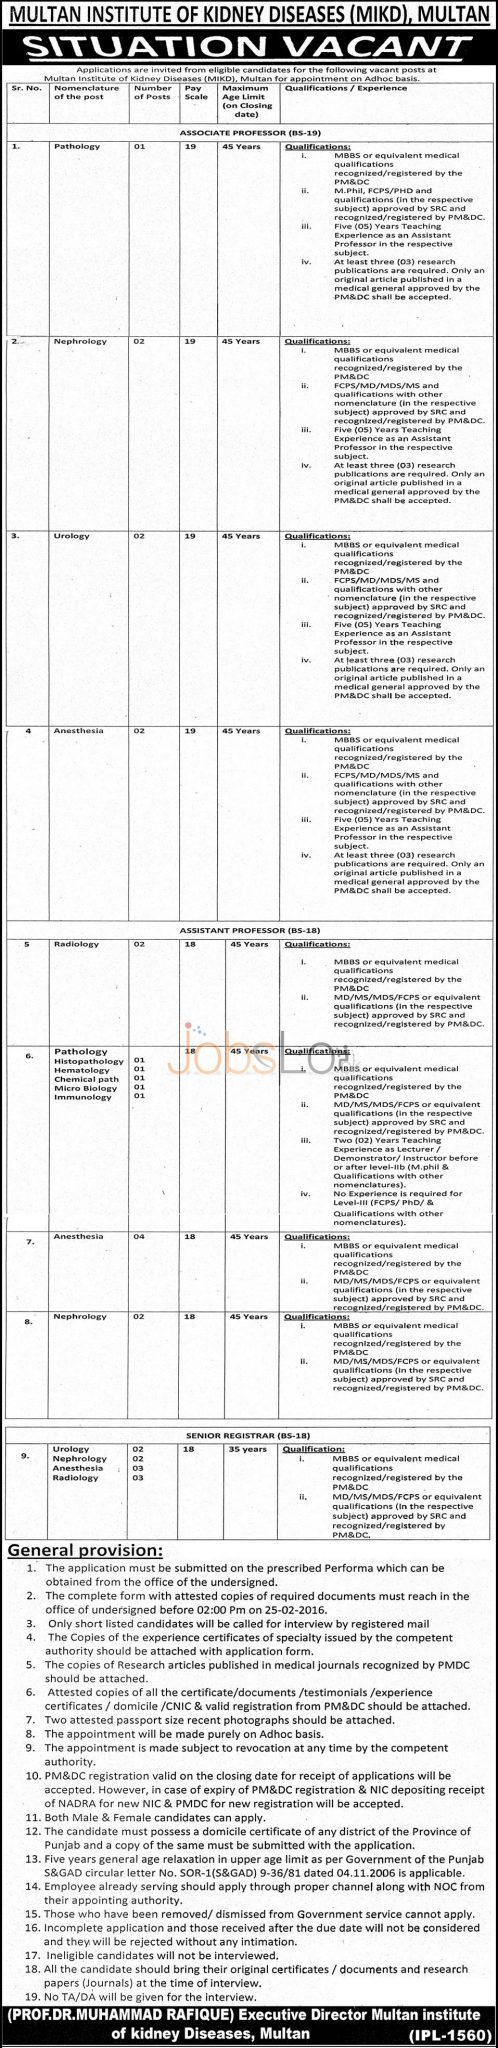 Situations Vacant in Institute of Kidney Disease Multan 2016 For Assistant Professor, Associate Professor ans Senior Registrar